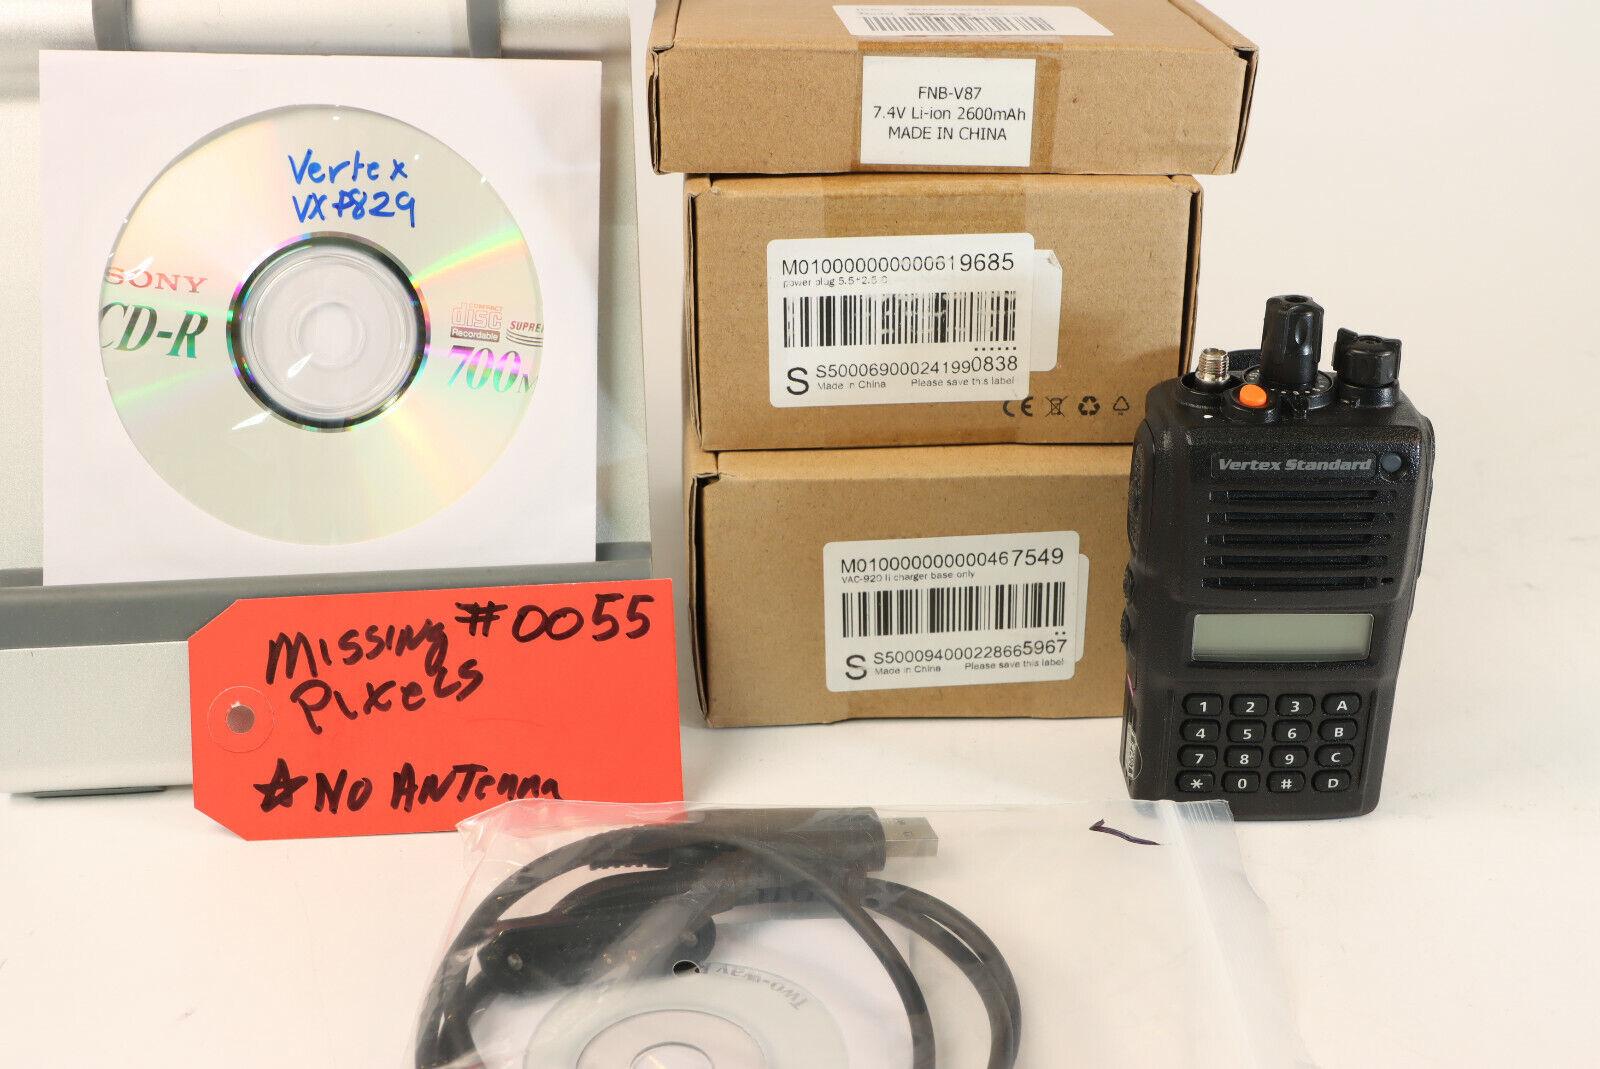 Vertex VX-P829 VHF 136-174MHz VXP829 P25 DES AES-256 #0055. Available Now for 199.99